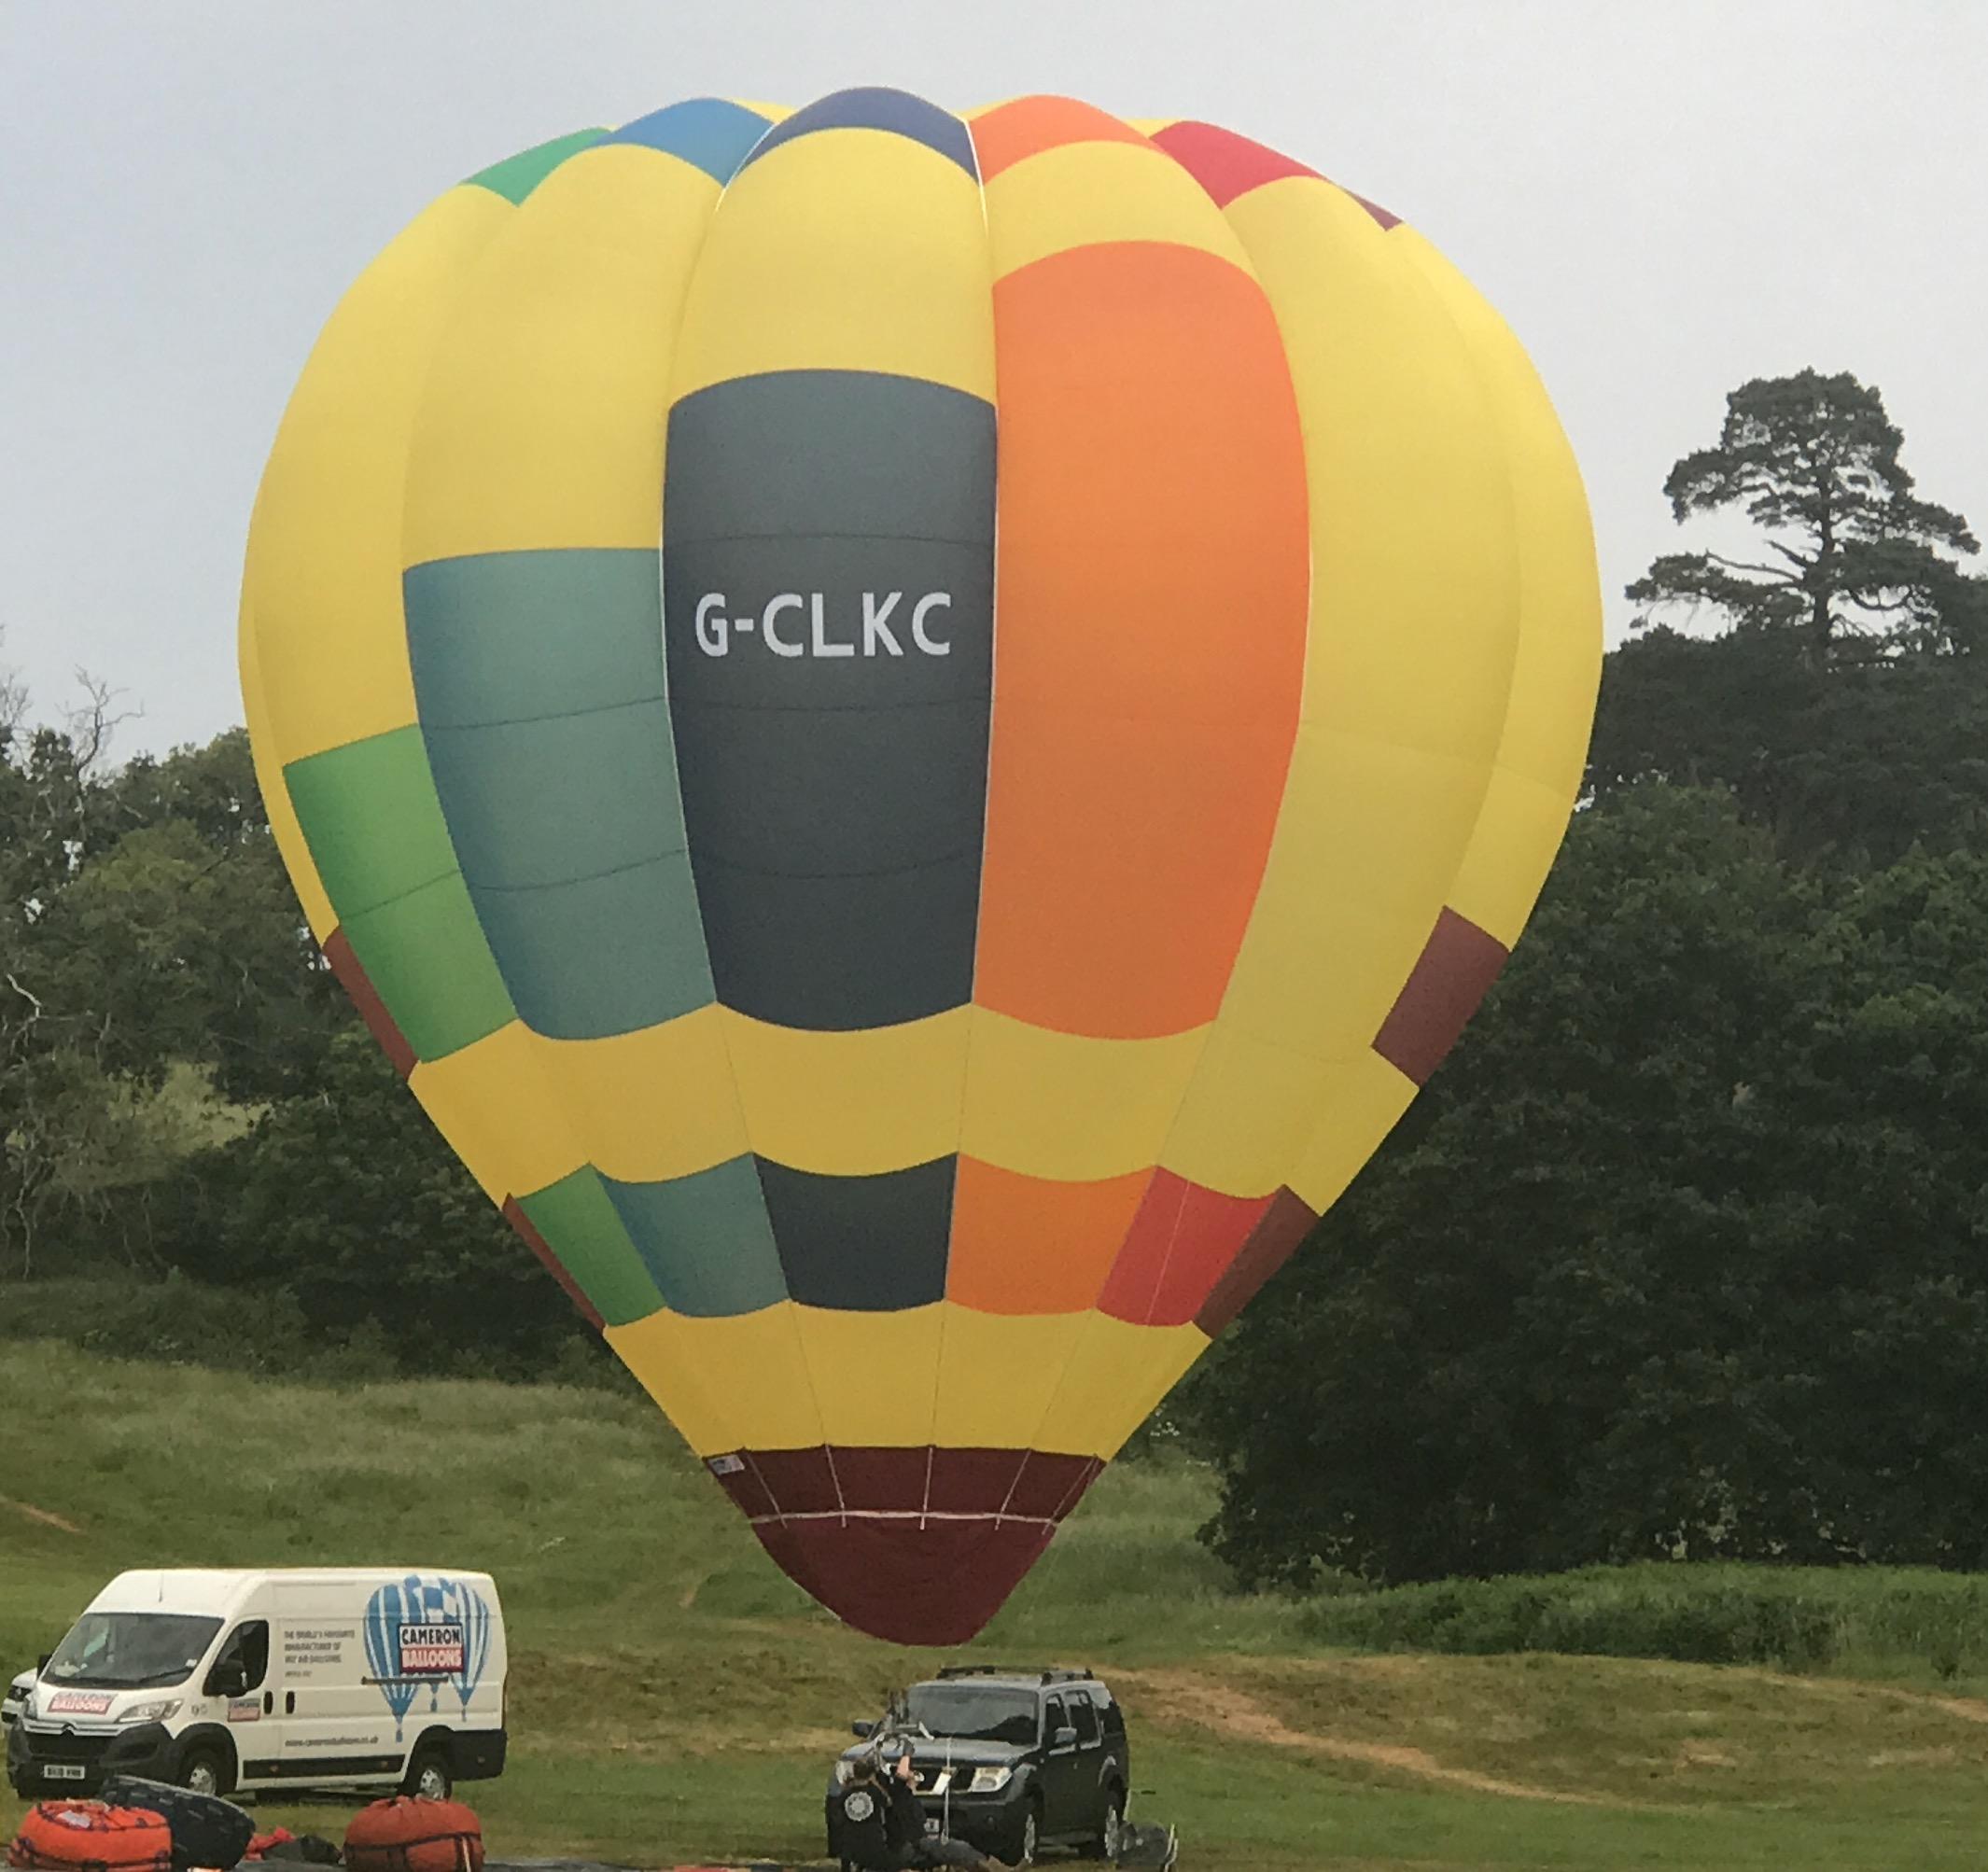 G-CLKC